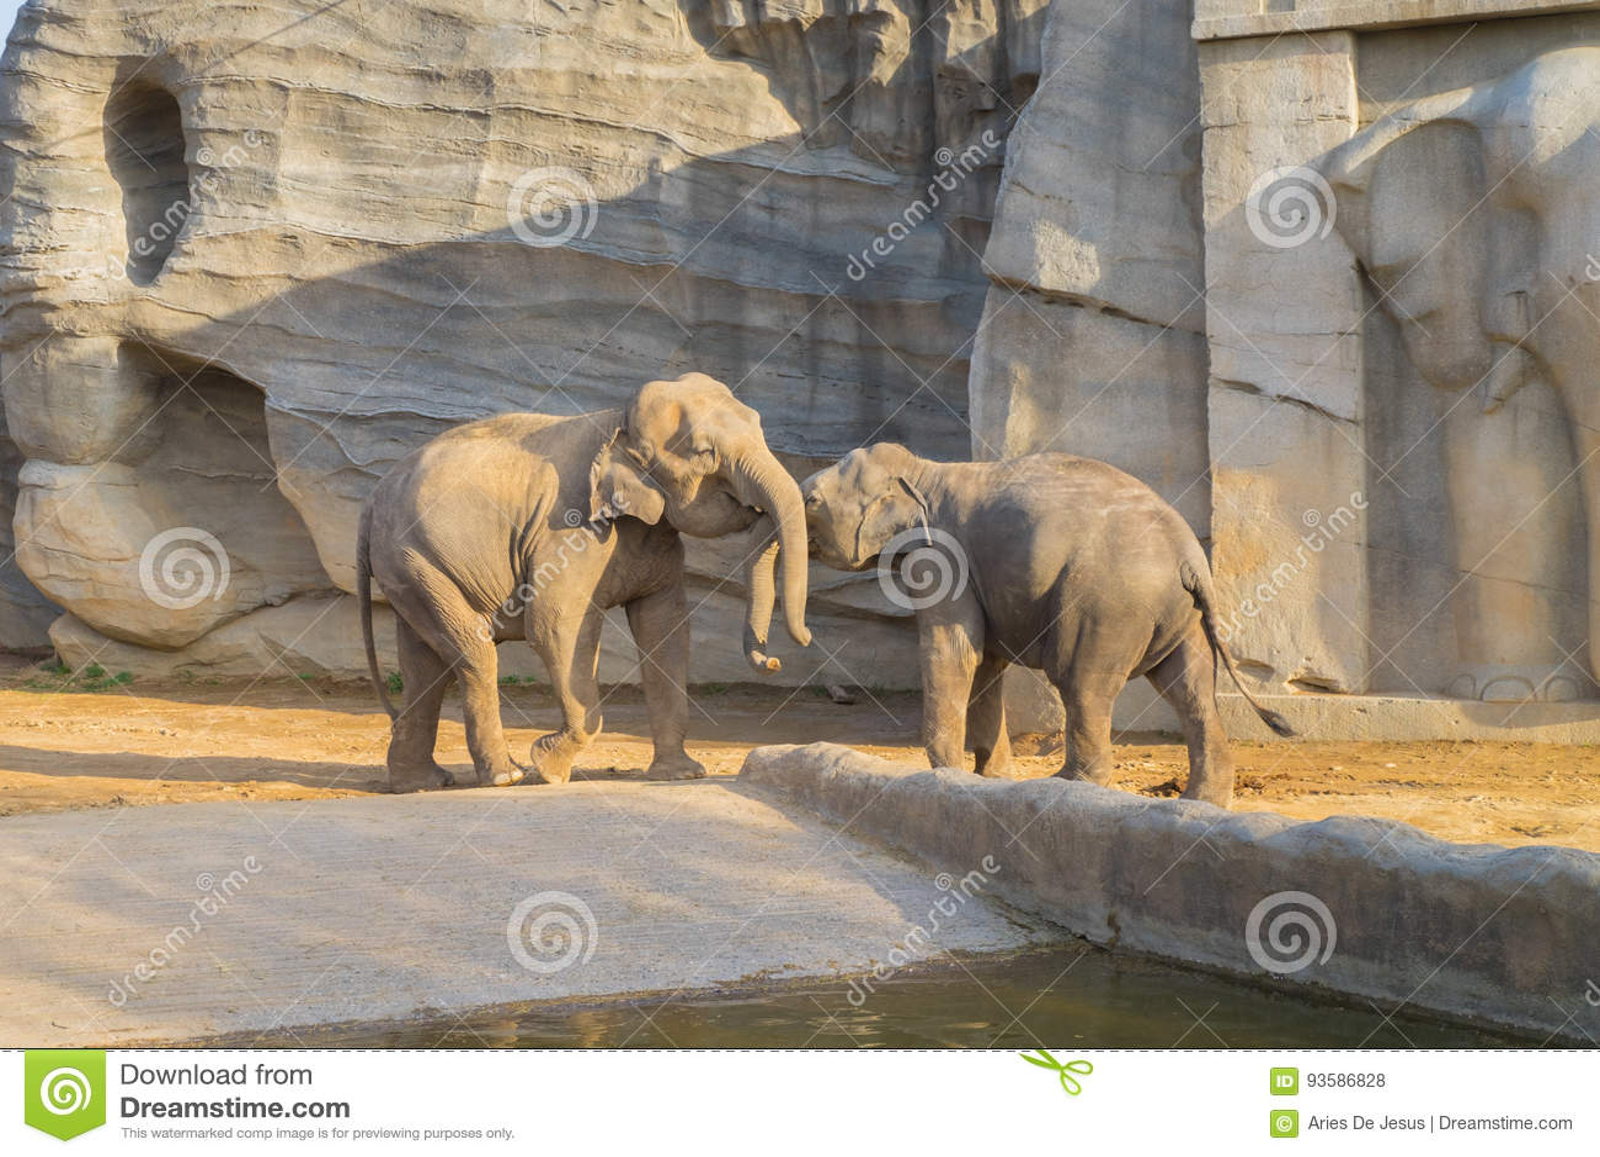 Elephant in Everland Zoo